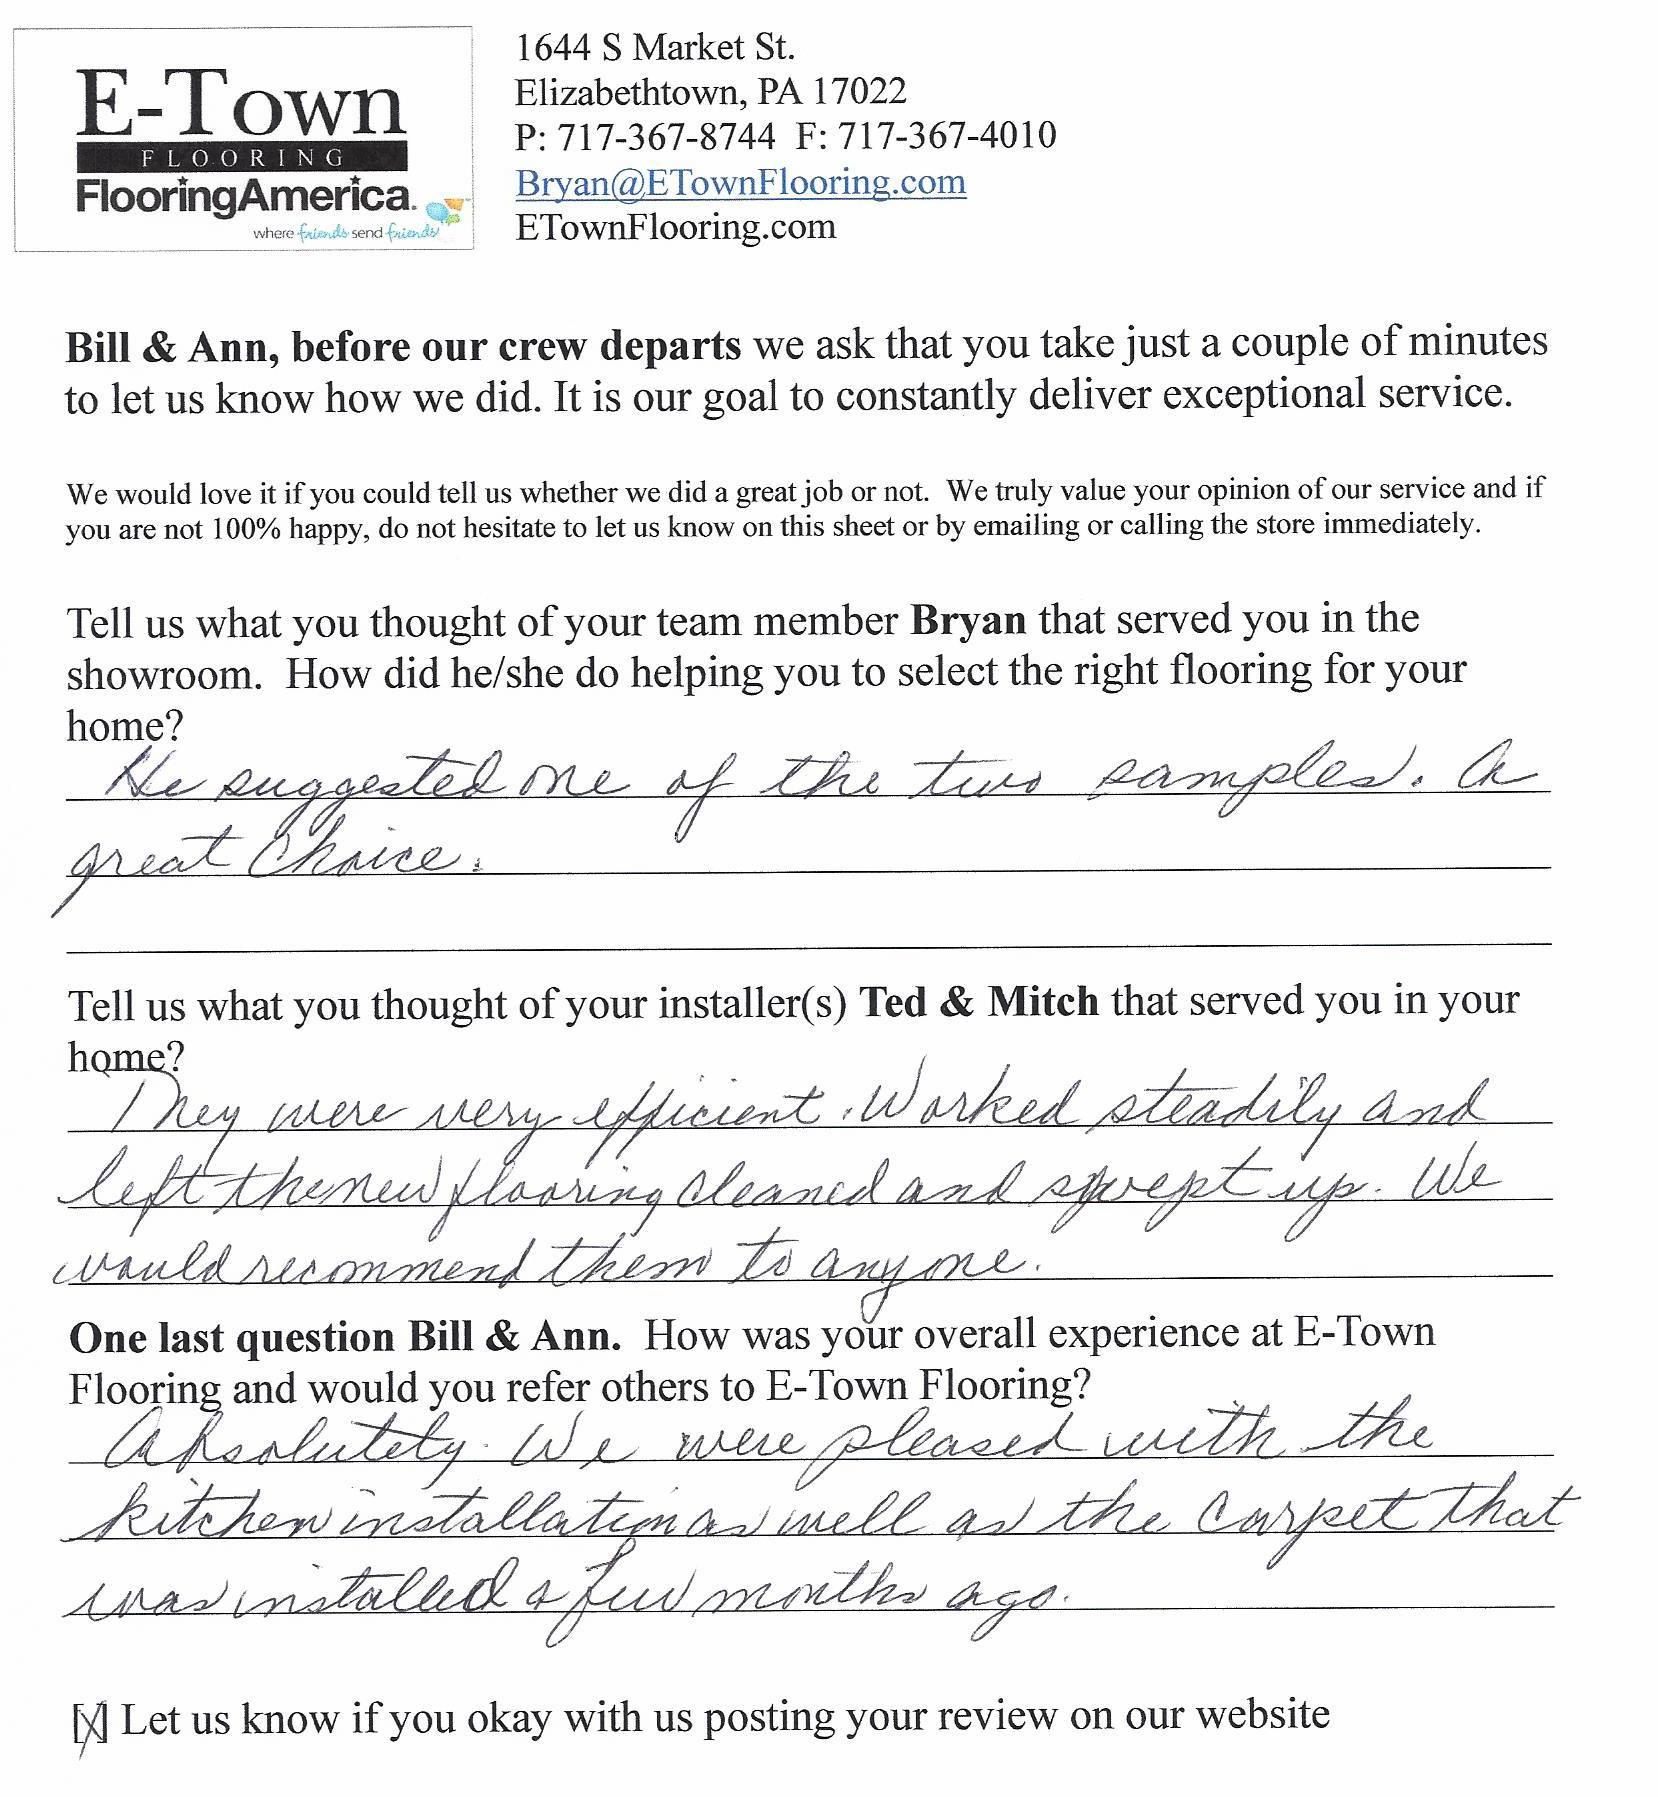 Flooring Review - Bill & Ann from Mount Joy.jpg